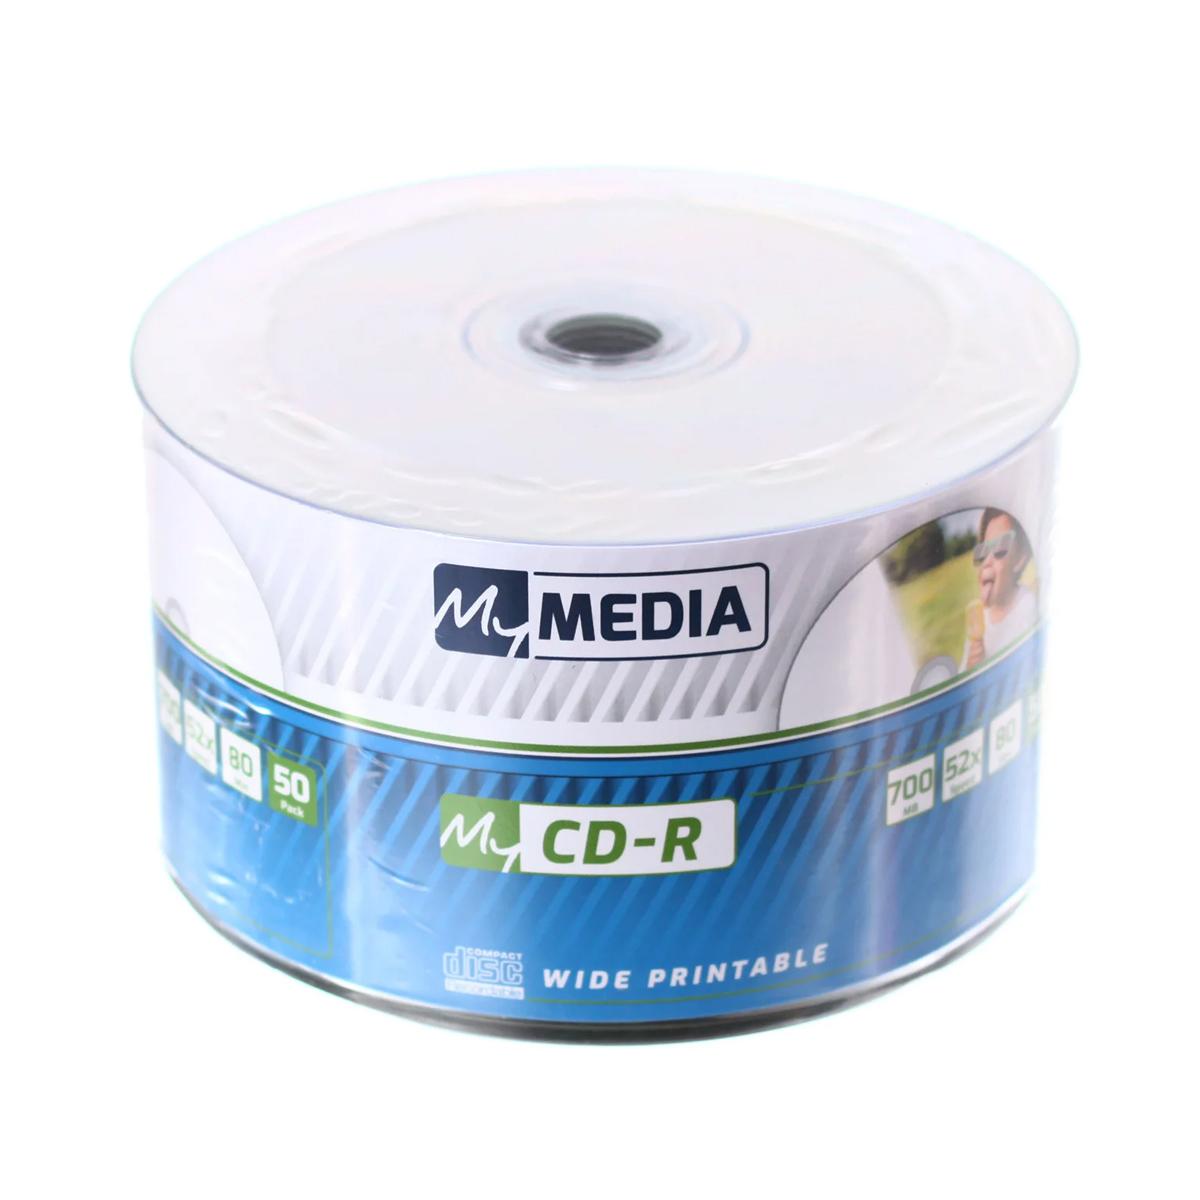 CDR 52X 50PK Wrap 700MB - Wide Printable (by Verbatim) - 69206